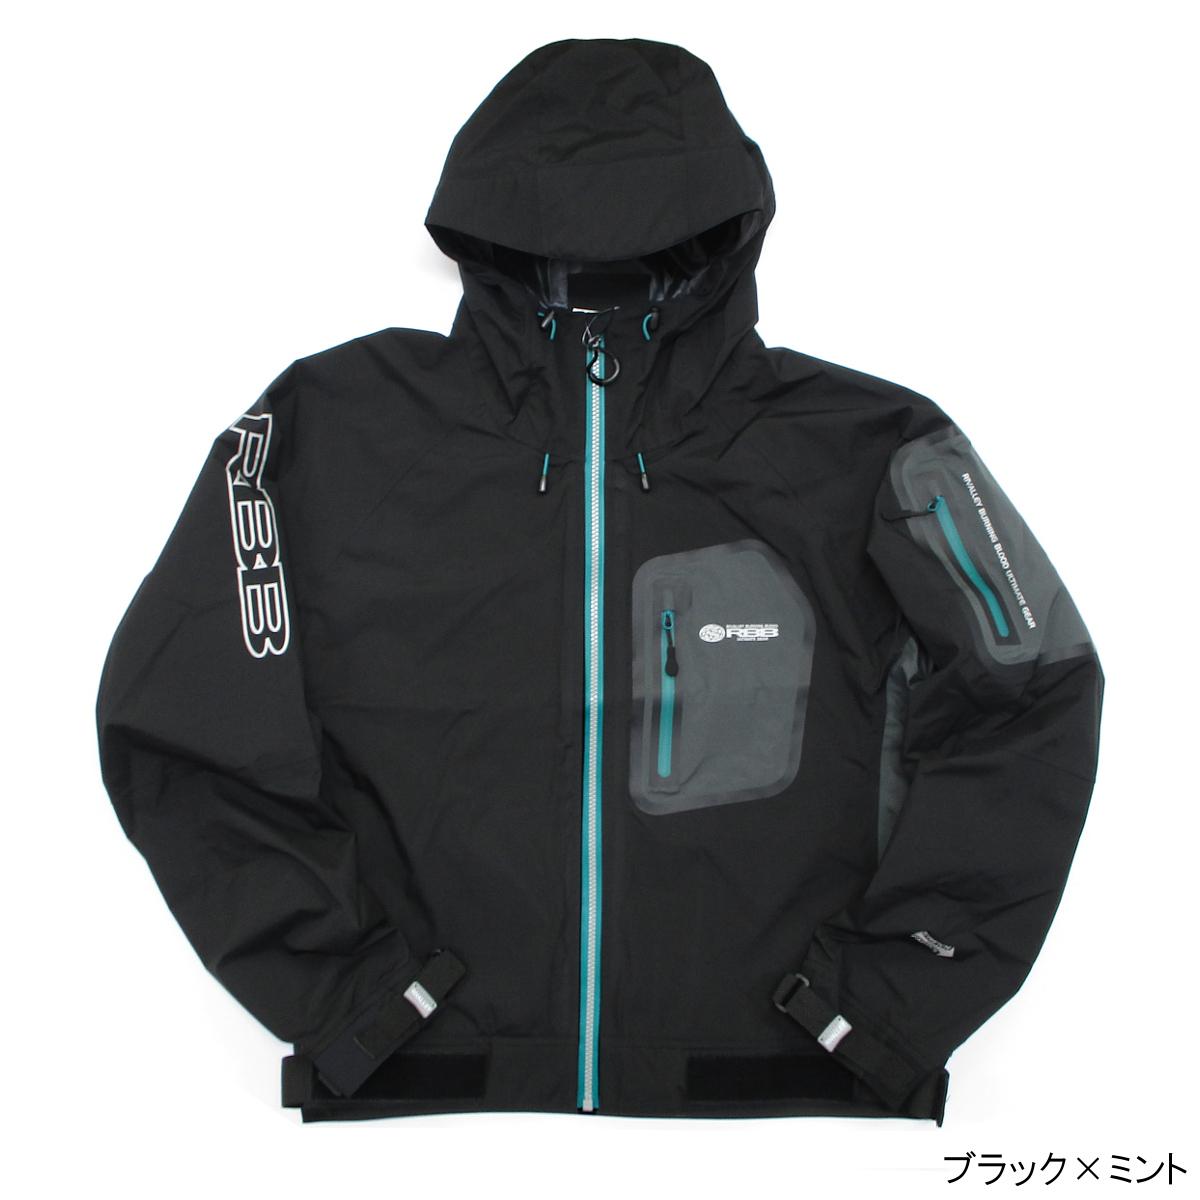 RBB タイドストレッチレインジャケット No.8746 M ブラック×ミント(東日本店)